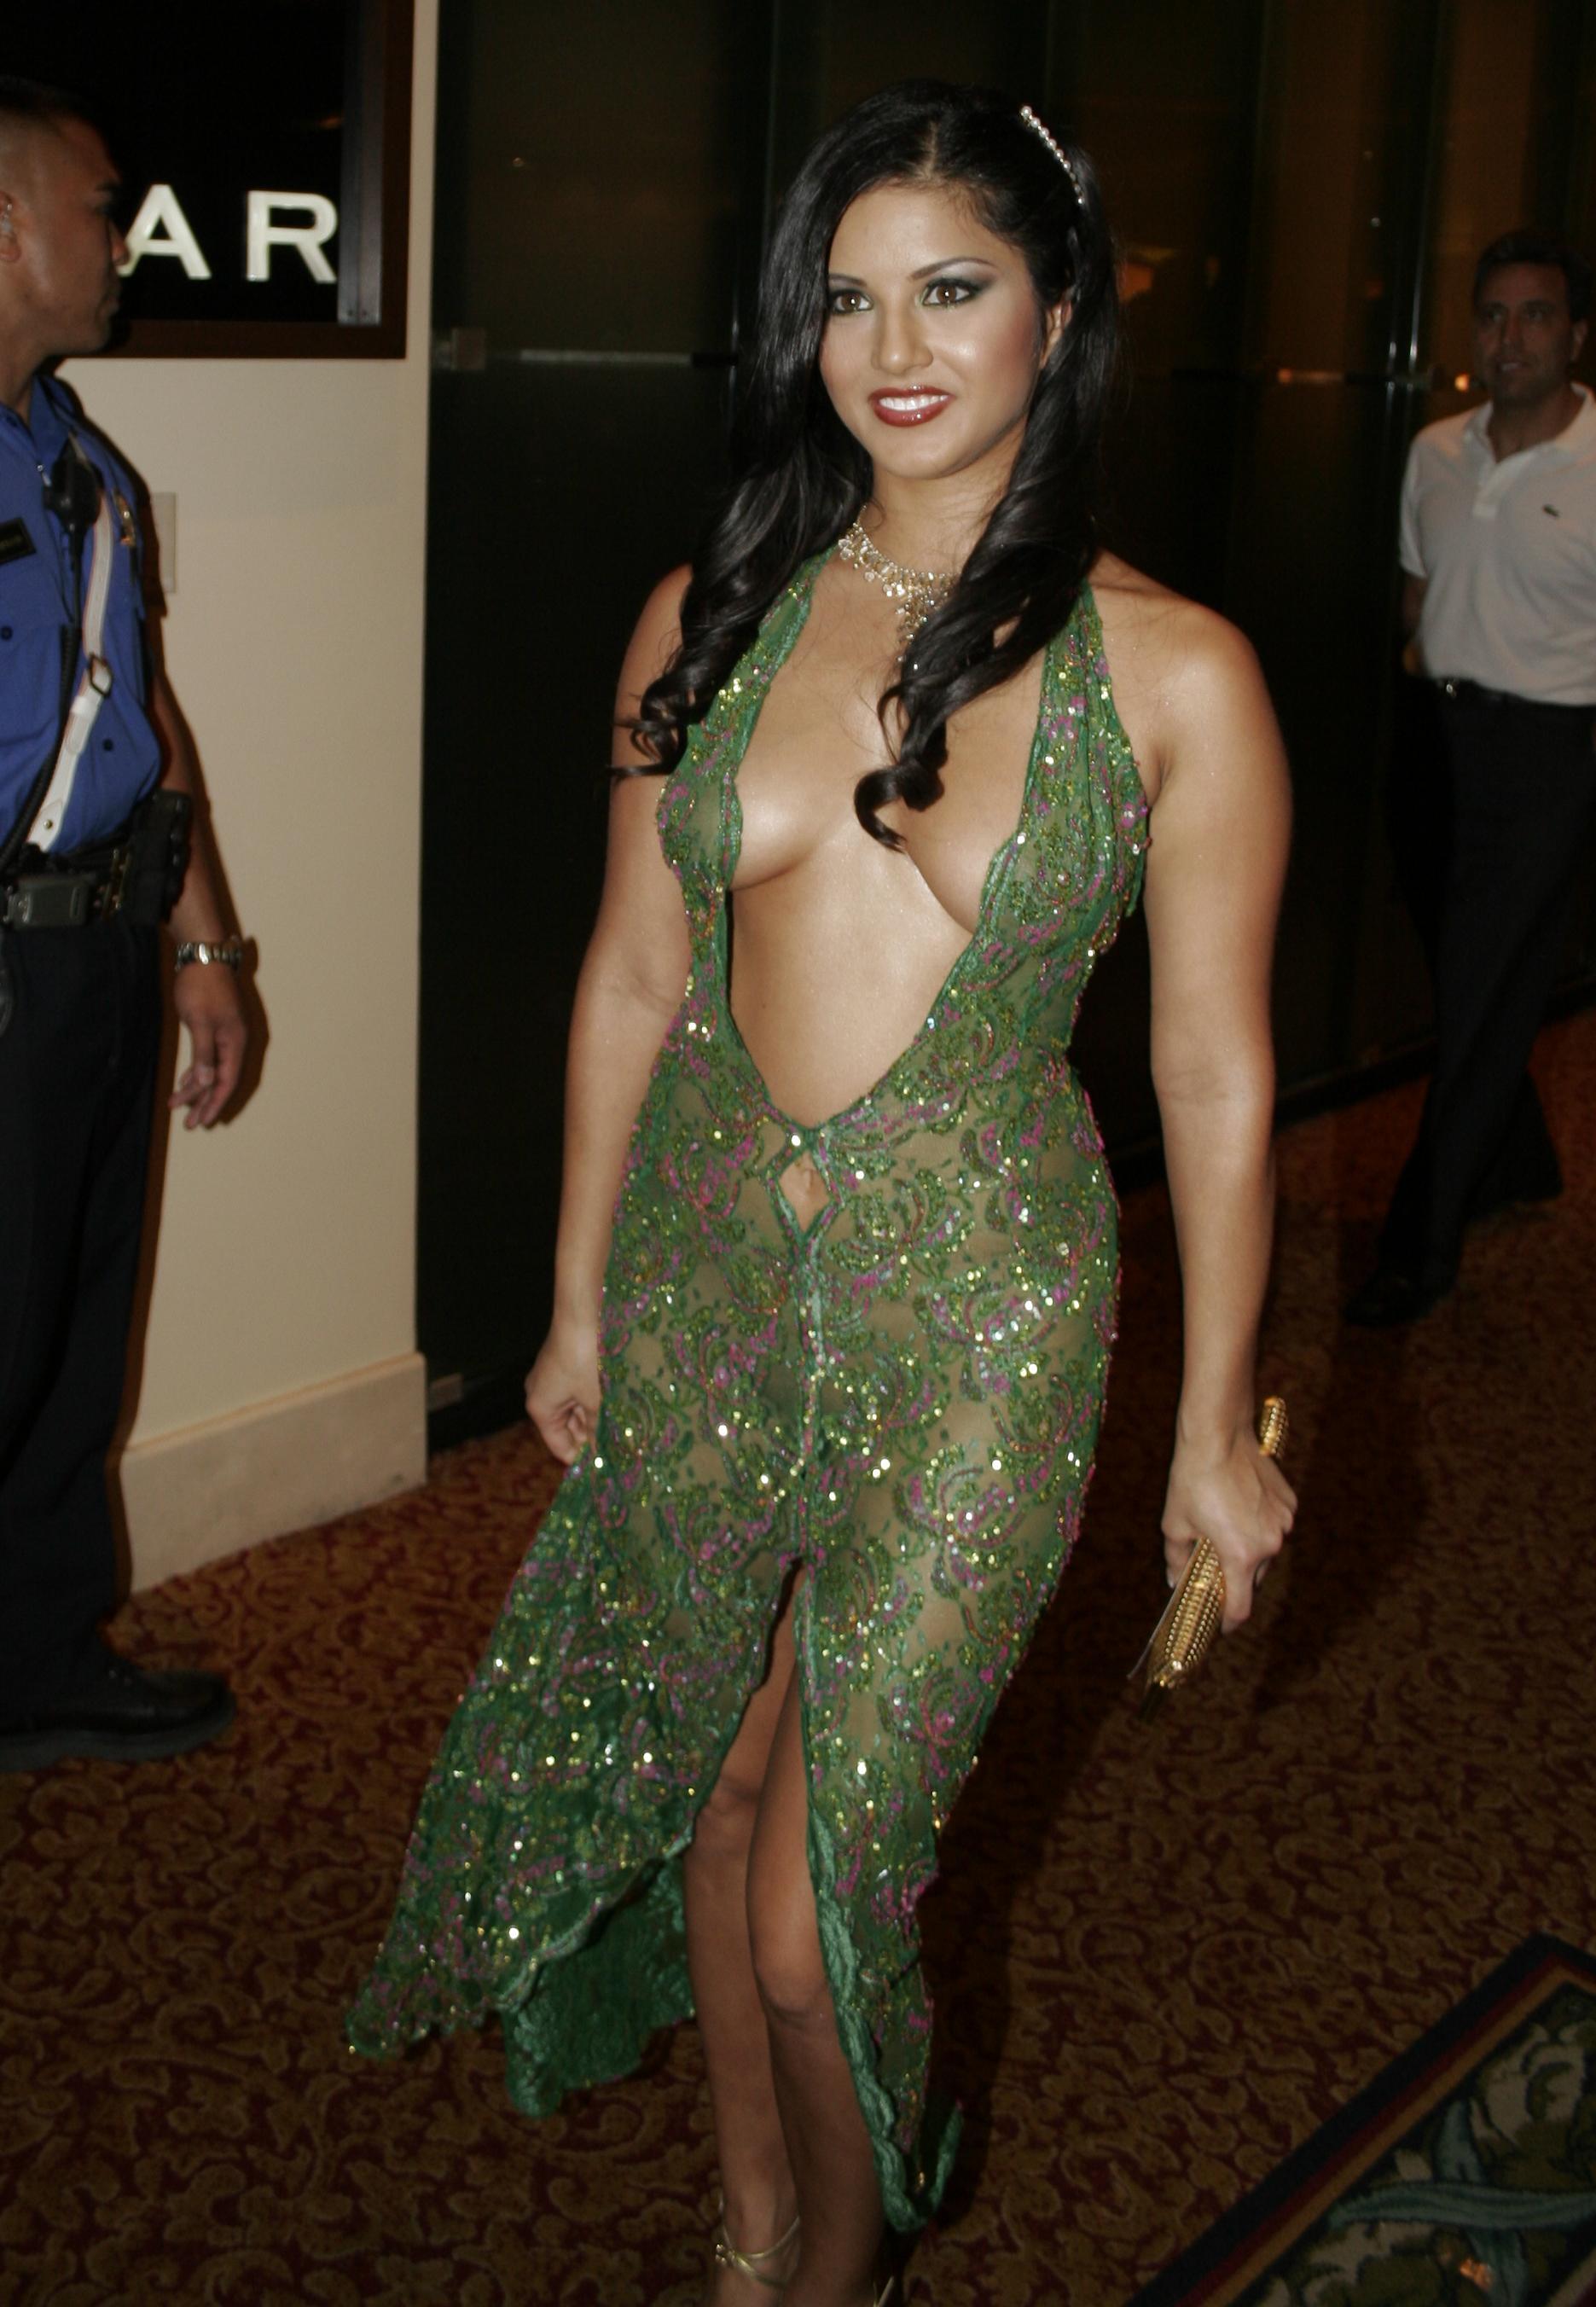 Sunny leone nude in award show